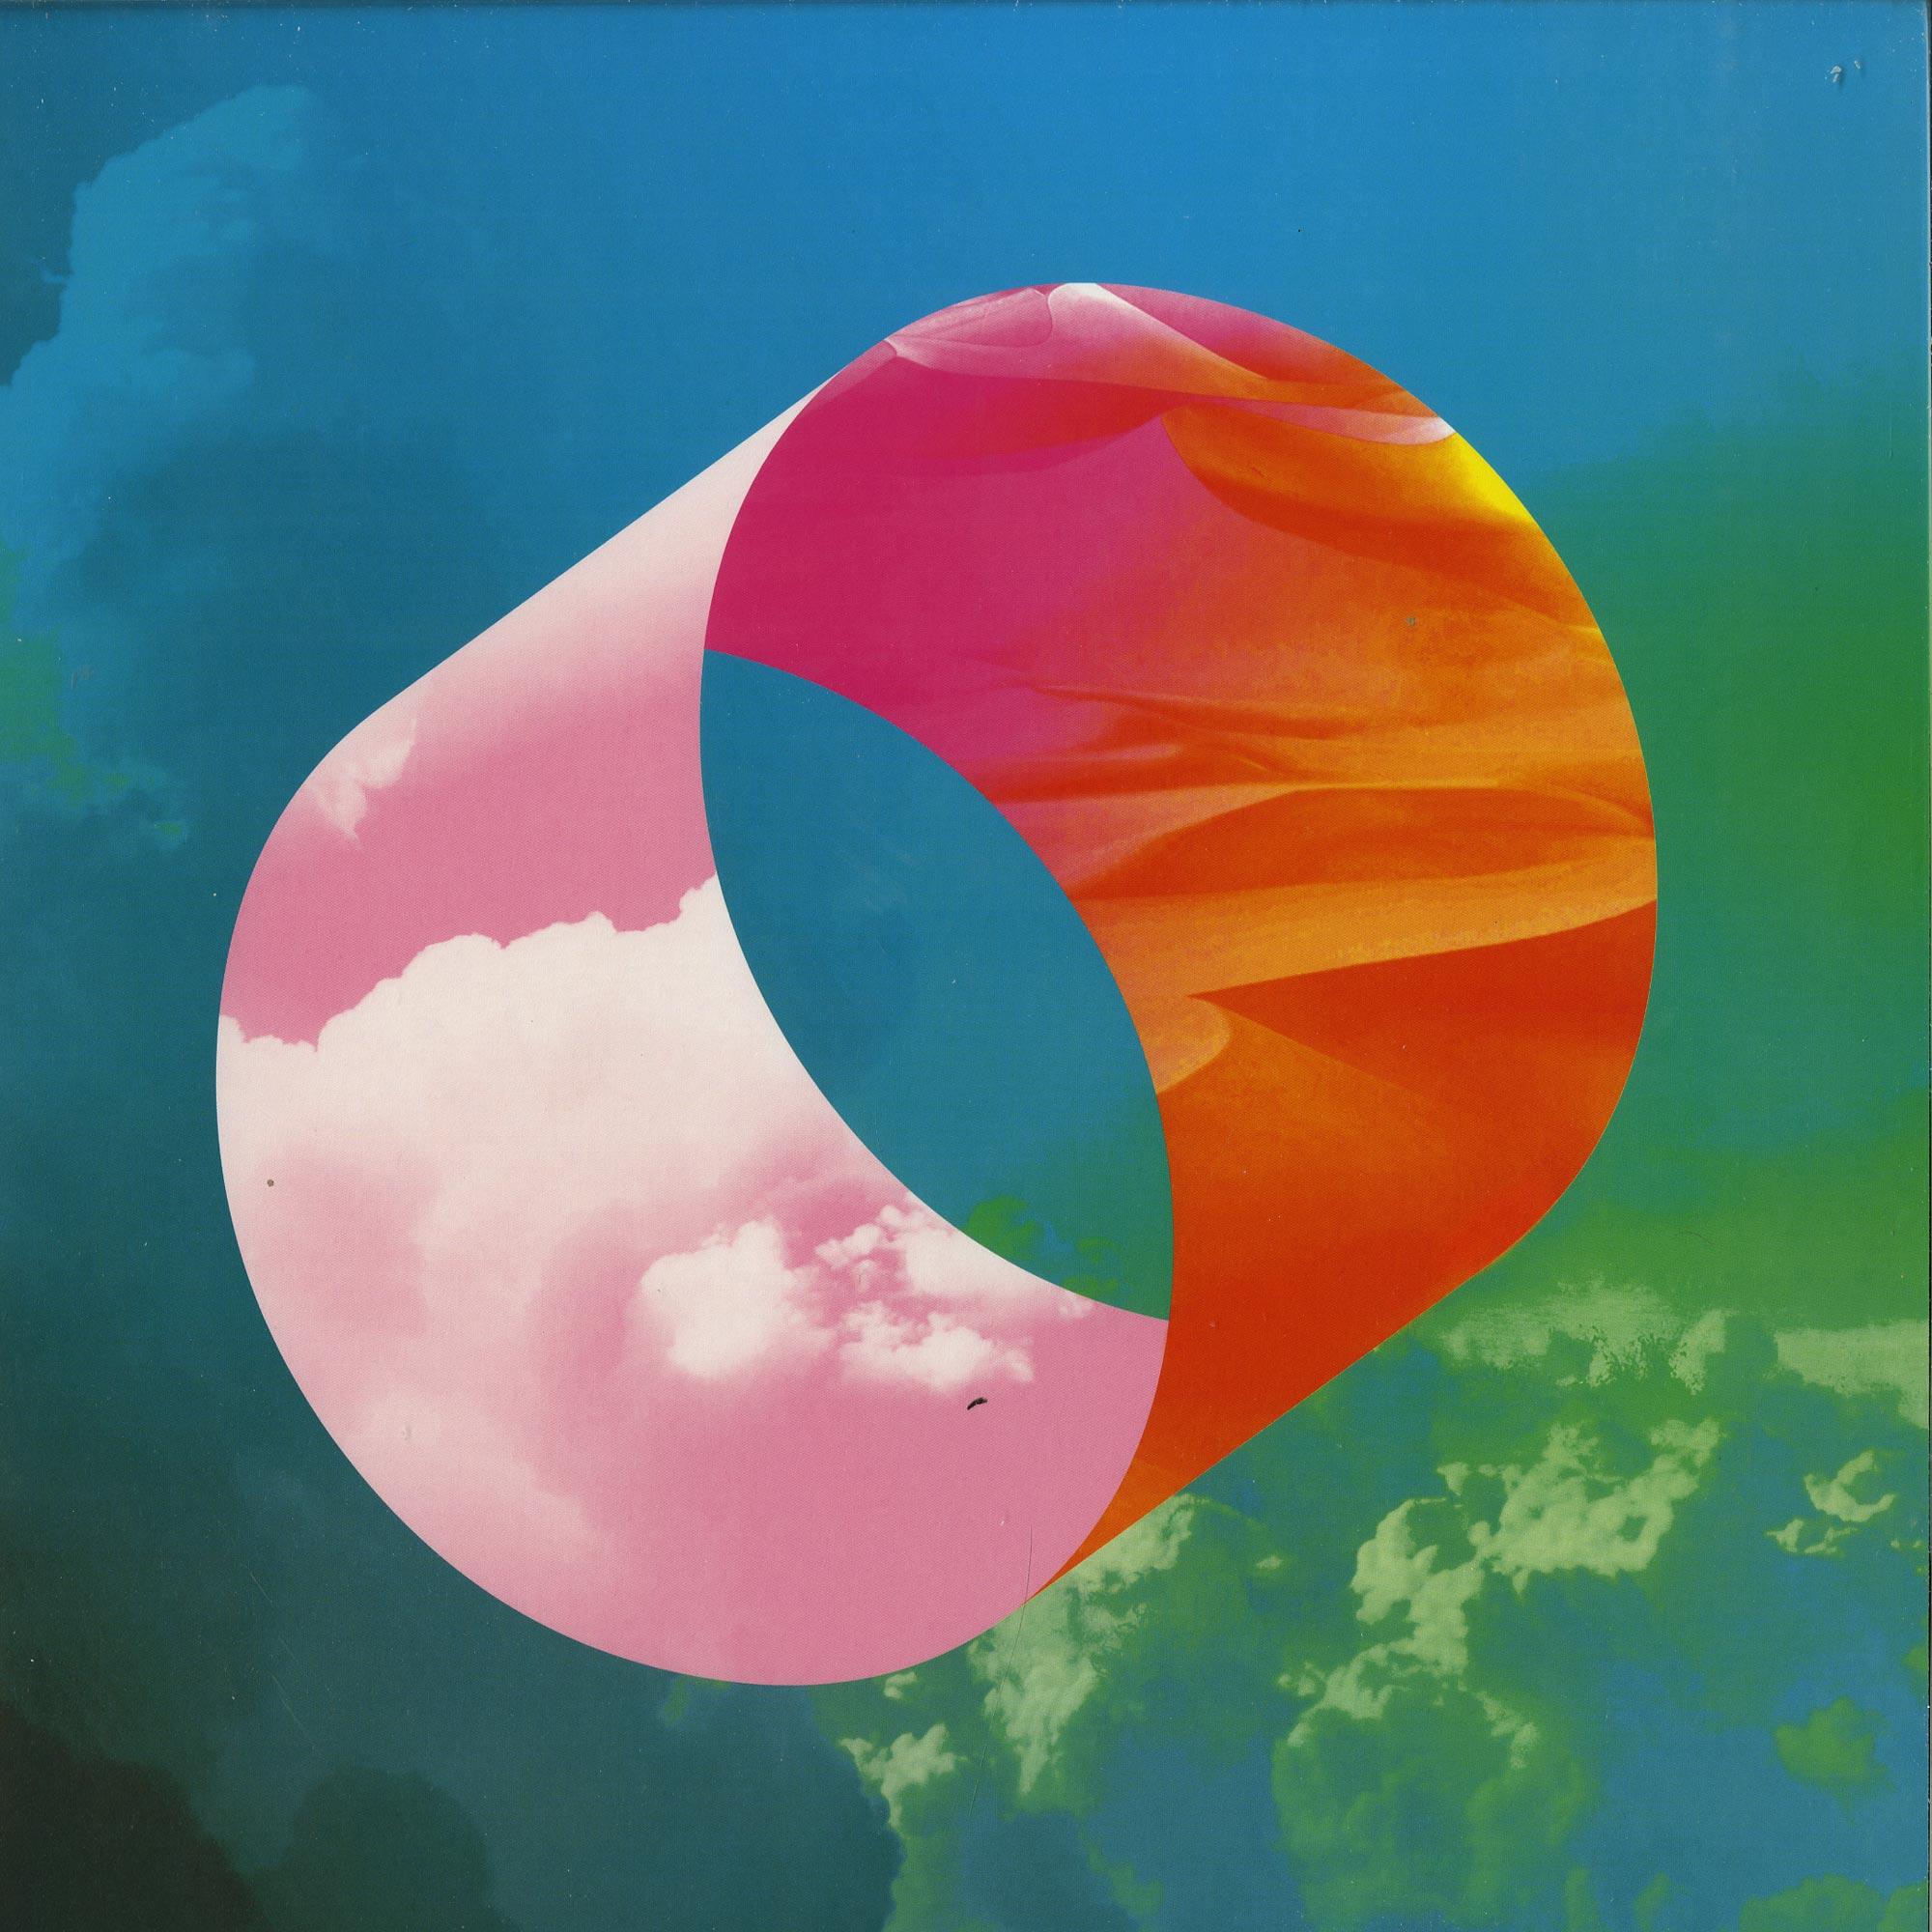 12tree - IN THE SUN EP